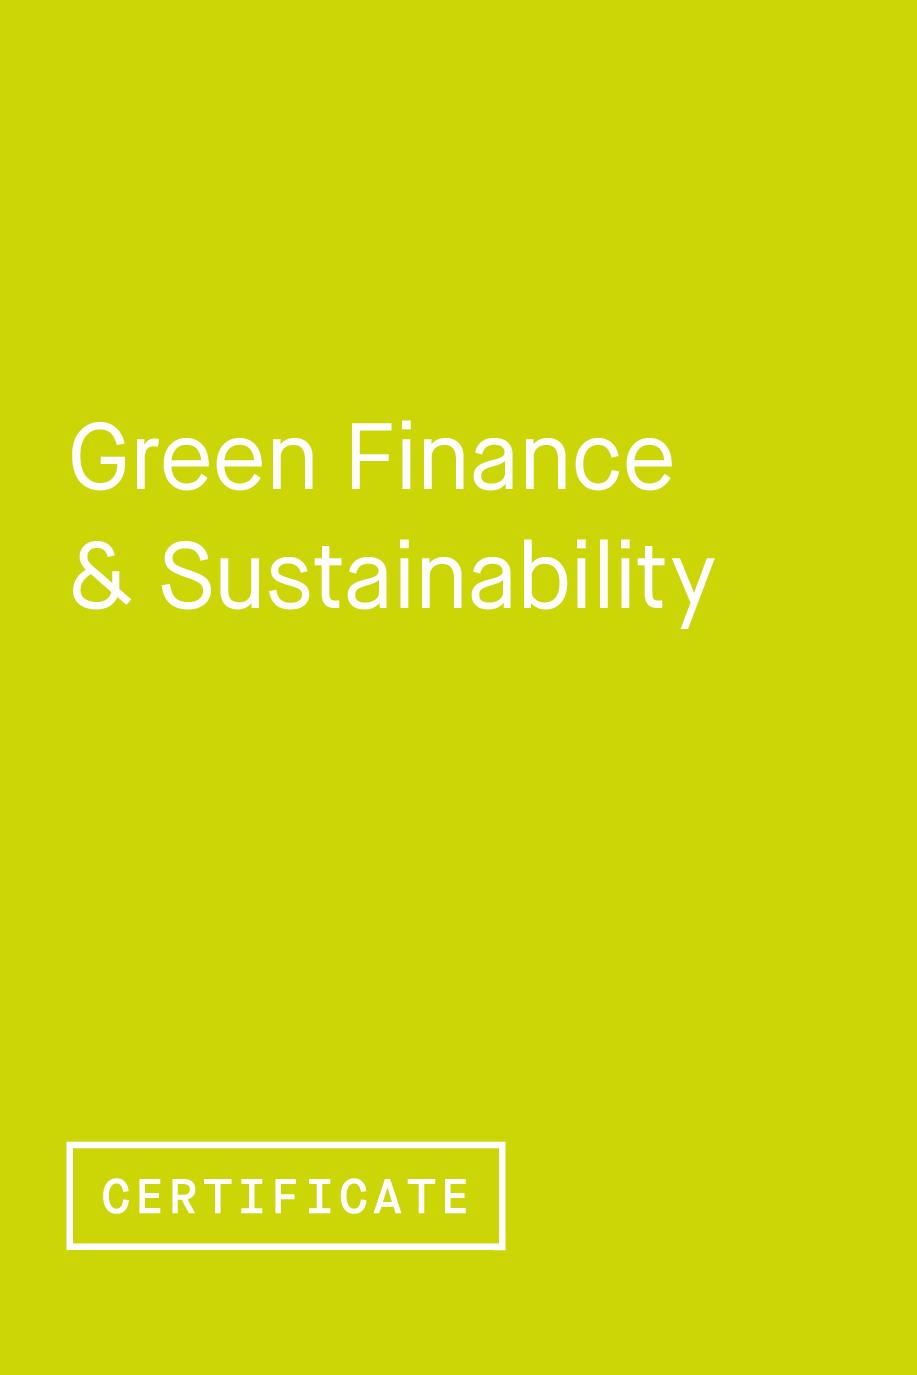 Green Finance & Sustainability